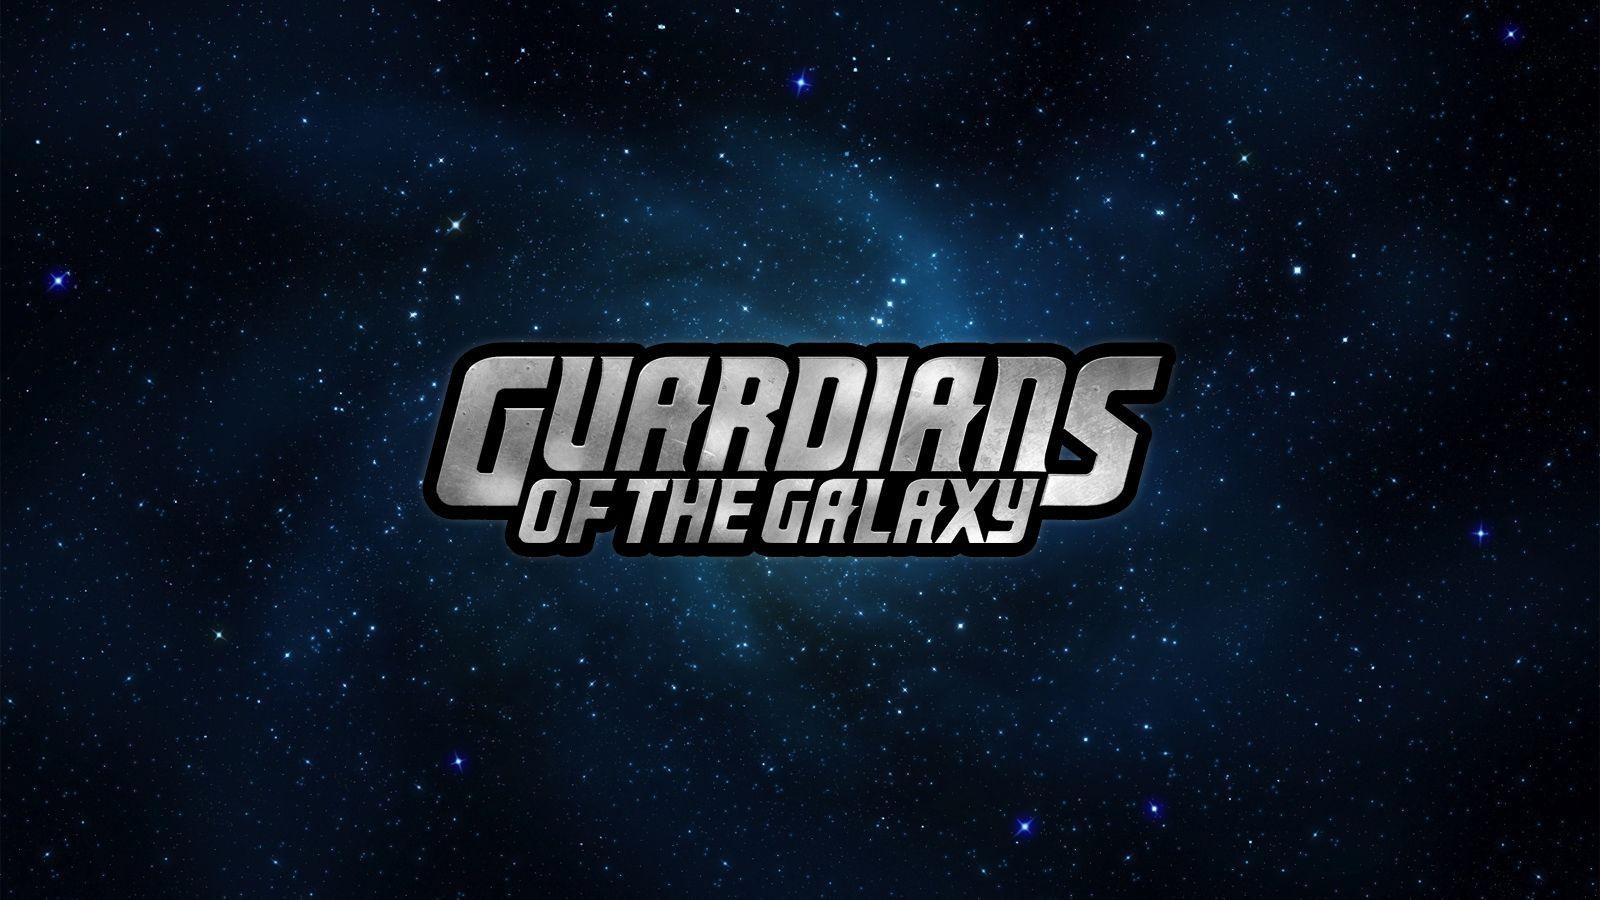 Guardians Of The Galaxy Logo Galaxy Wallpaper Guardians Of The Galaxy Galaxy